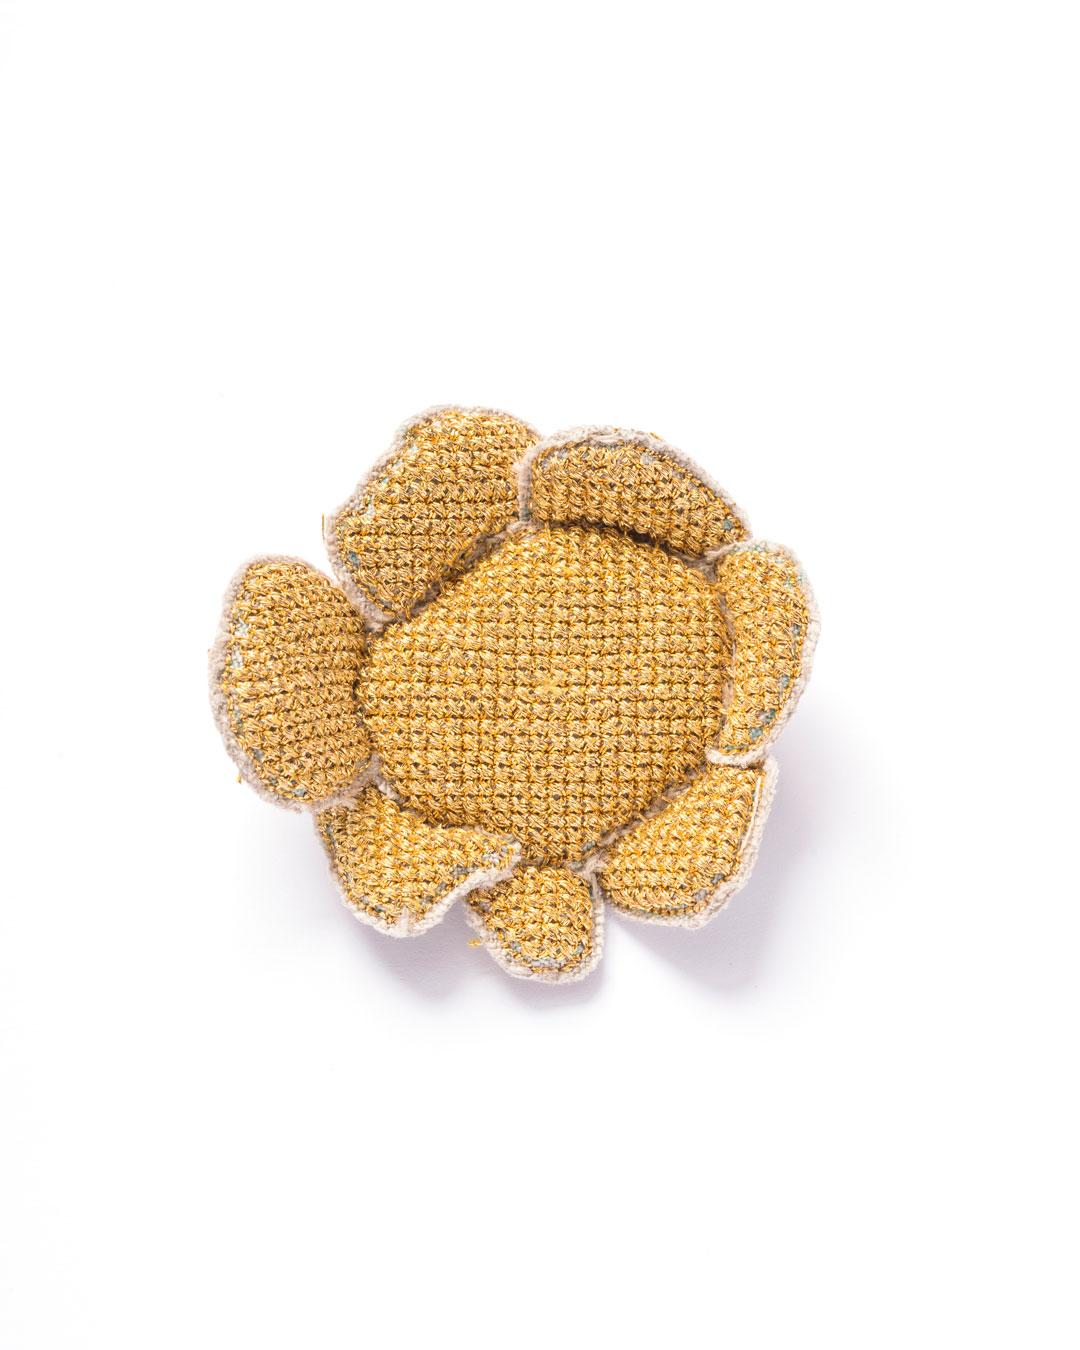 Carla Nuis, Golden Cuddles – Flower Brooch 1 (1/7), 2014, brooch; unbleached linen, 24ct gold kimono thread, linen flax fibres, 80 x 60 x 20 mm, €1100